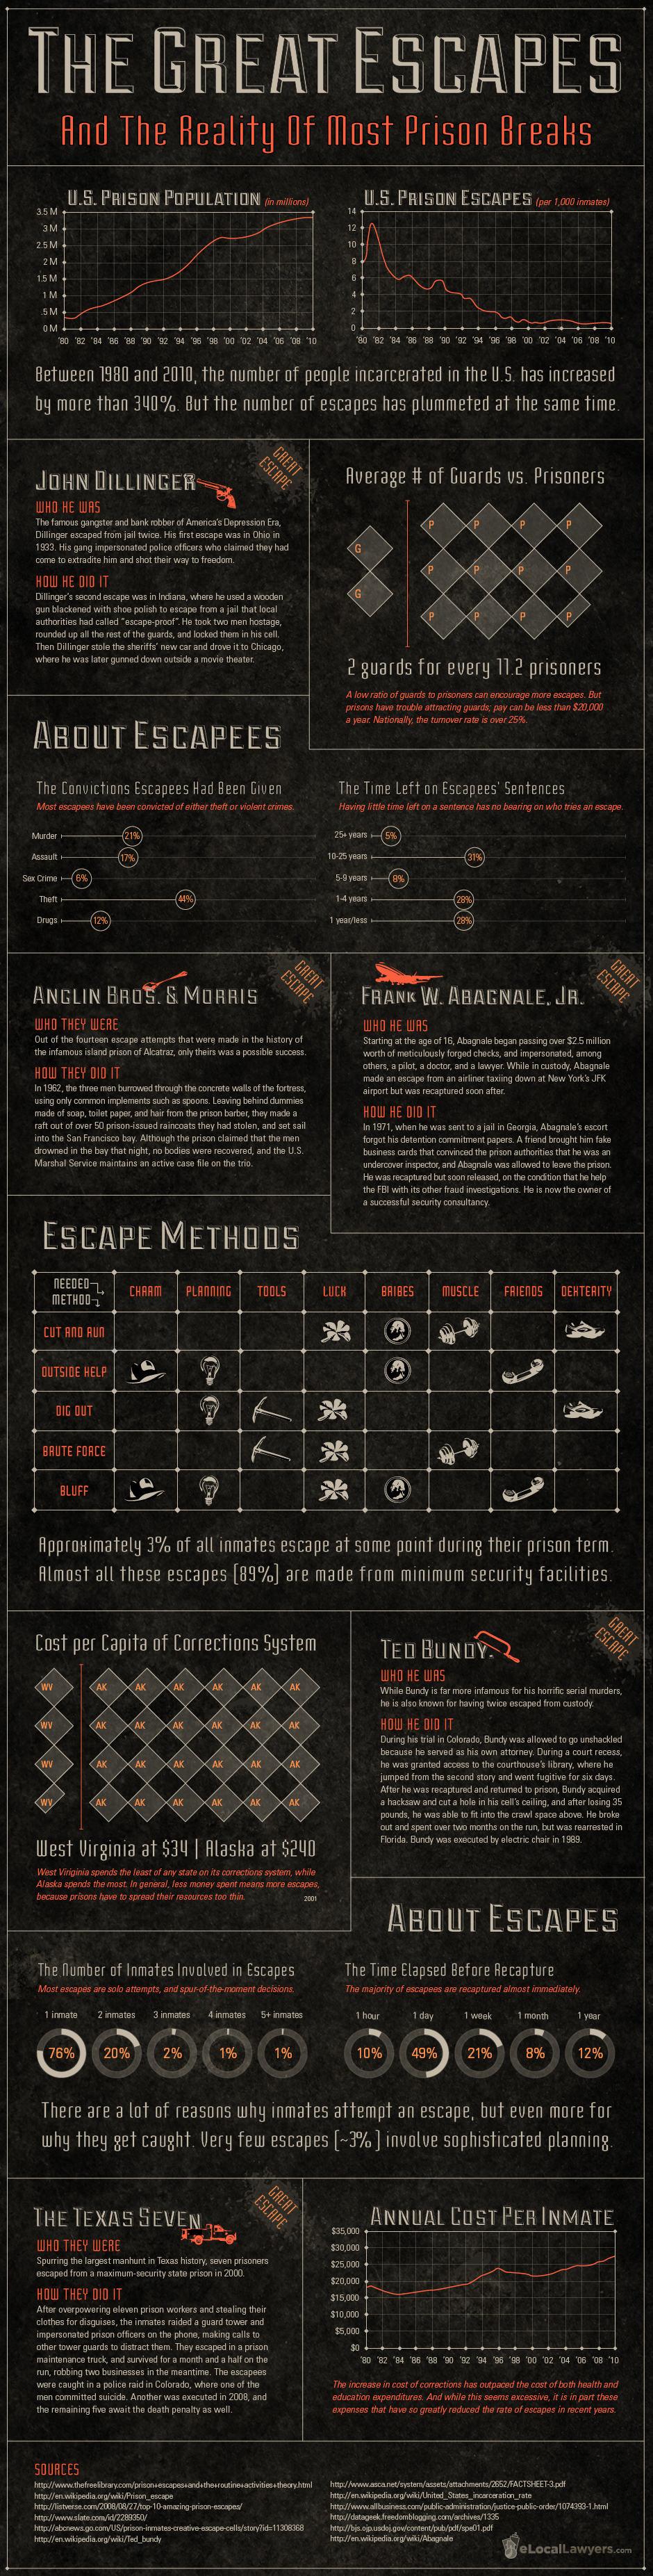 Great Prison Escapes InfoGraphic